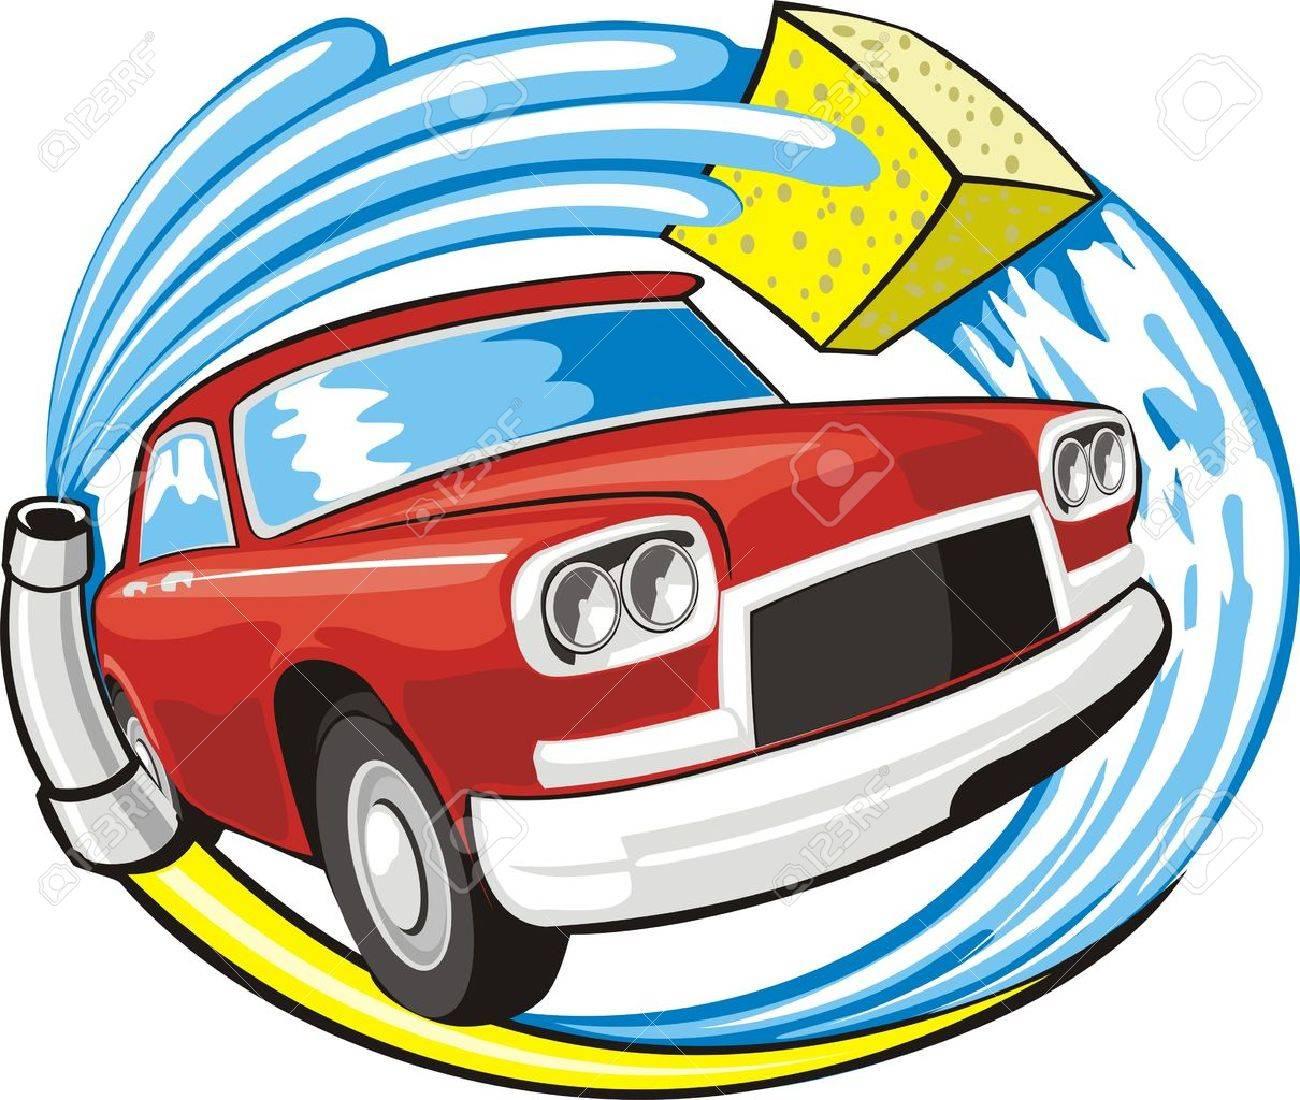 car washing sign royalty free cliparts vectors and stock rh 123rf com car wash vector background car wash vector free